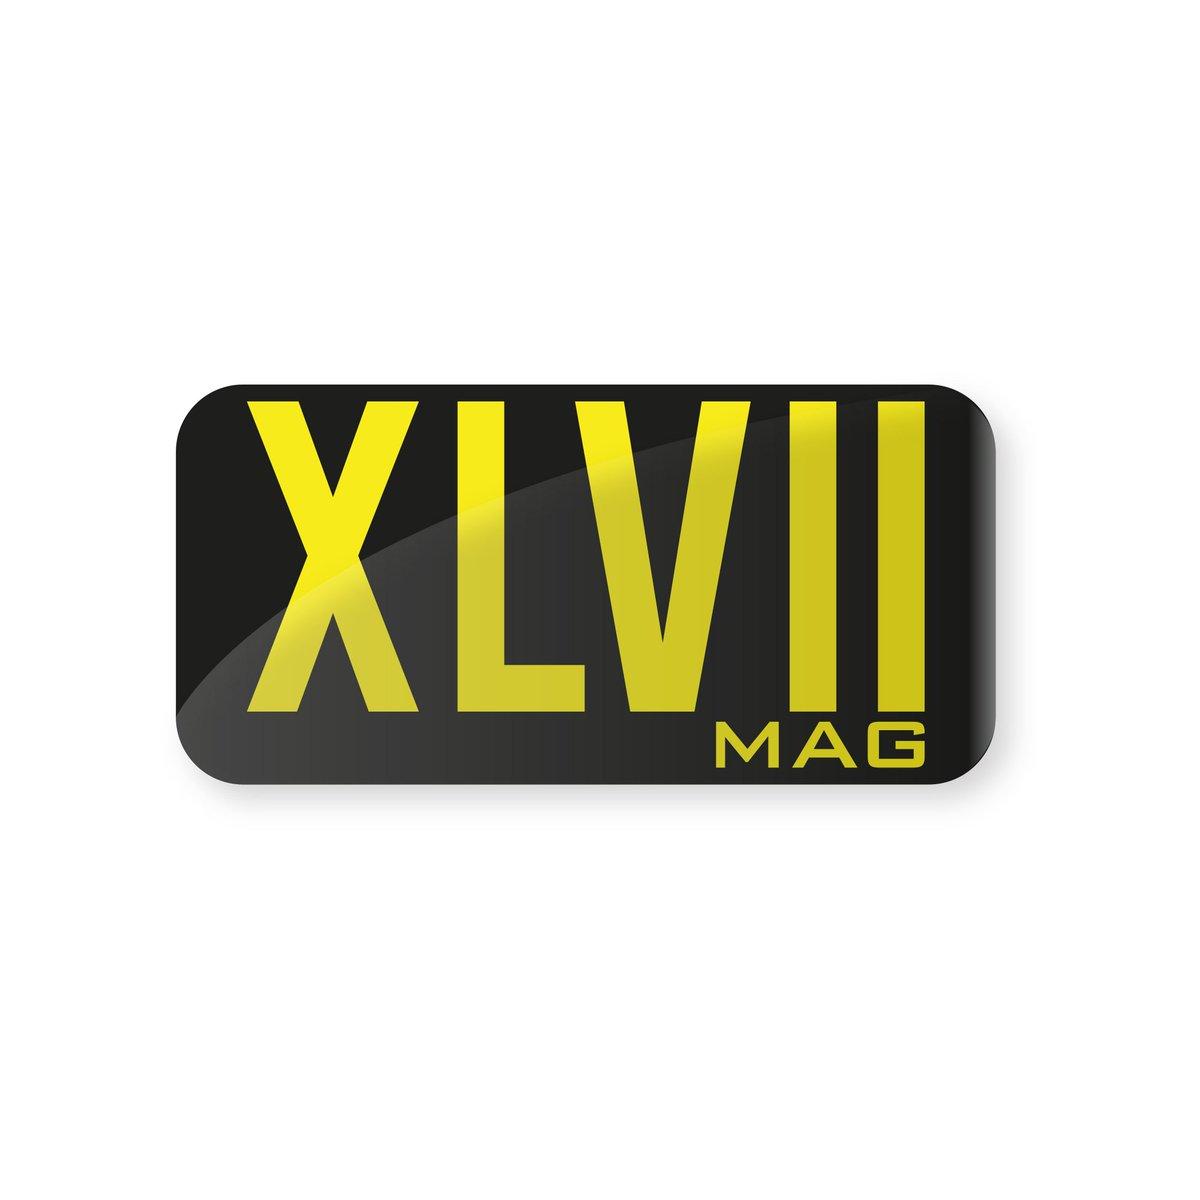 #xlviimag  Looking for #artists &amp; #music #producer, #singers, #edm, #djs #musicnews #soundcloud @prettytee_da1 @cmobbrecords<br>http://pic.twitter.com/UzoyD9OaiQ